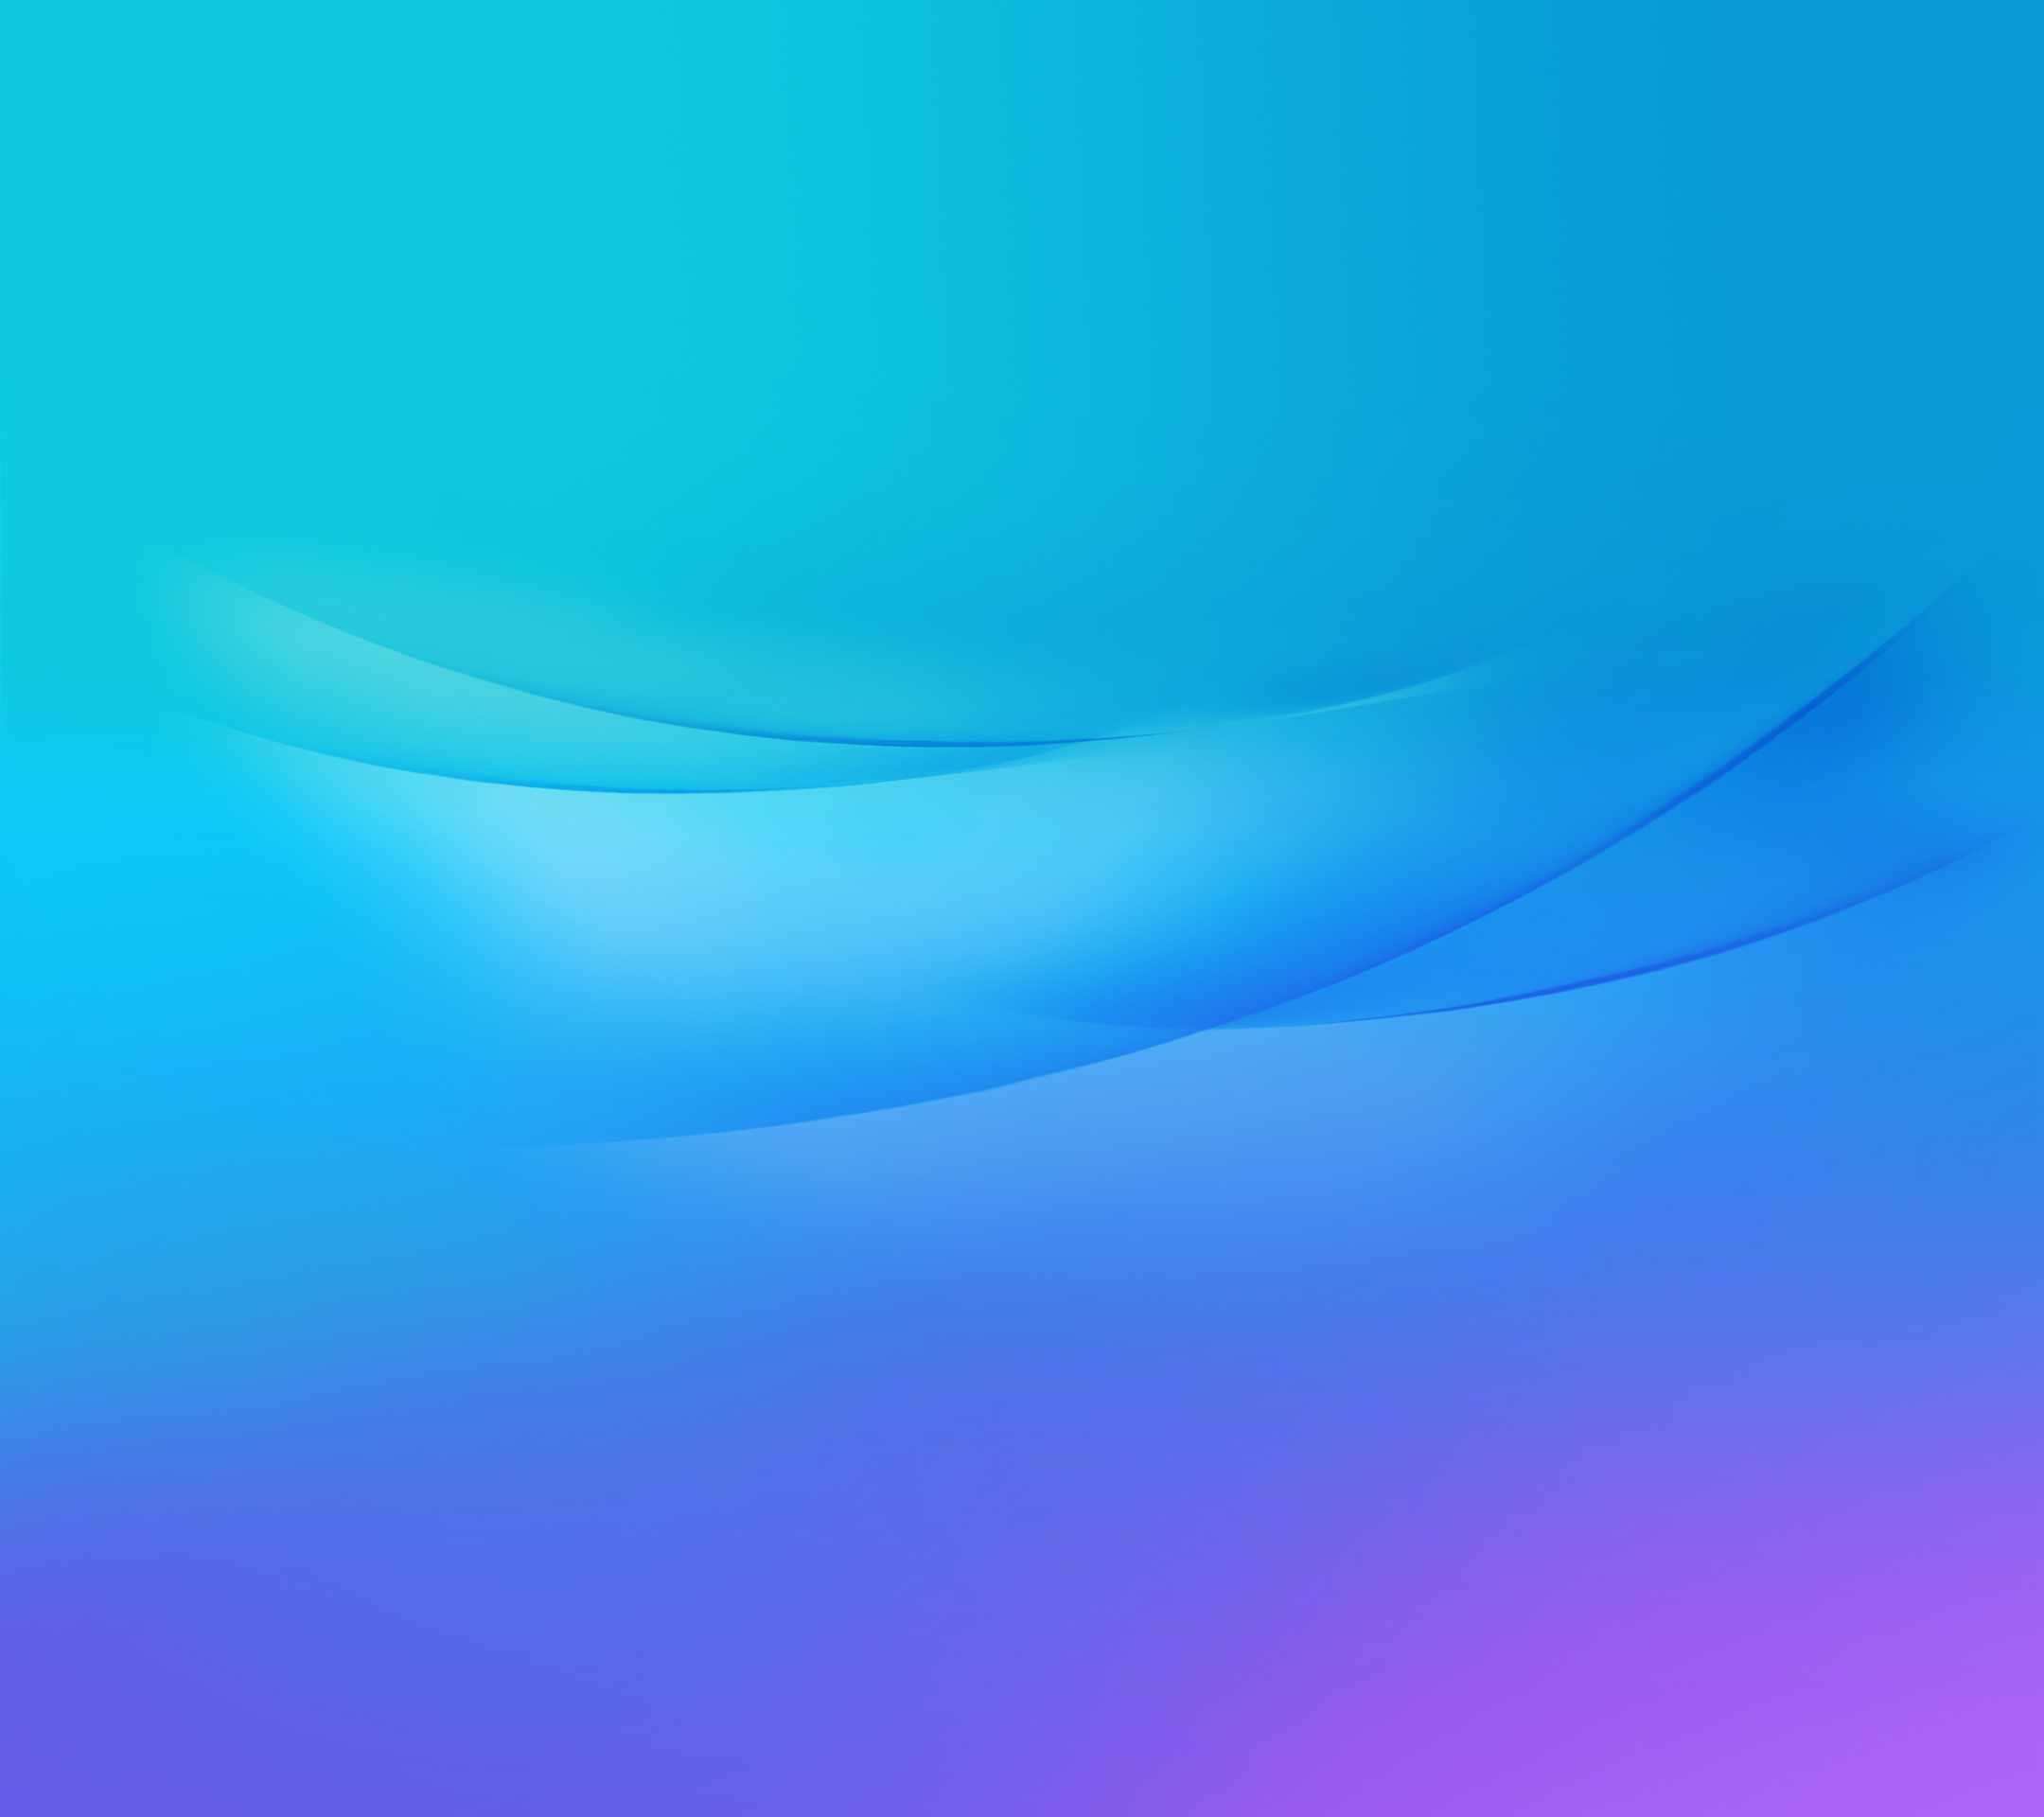 5 Inch Screen Hd Wallpapers Download Huawei Nova Stock Wallpapers In Quad Hd